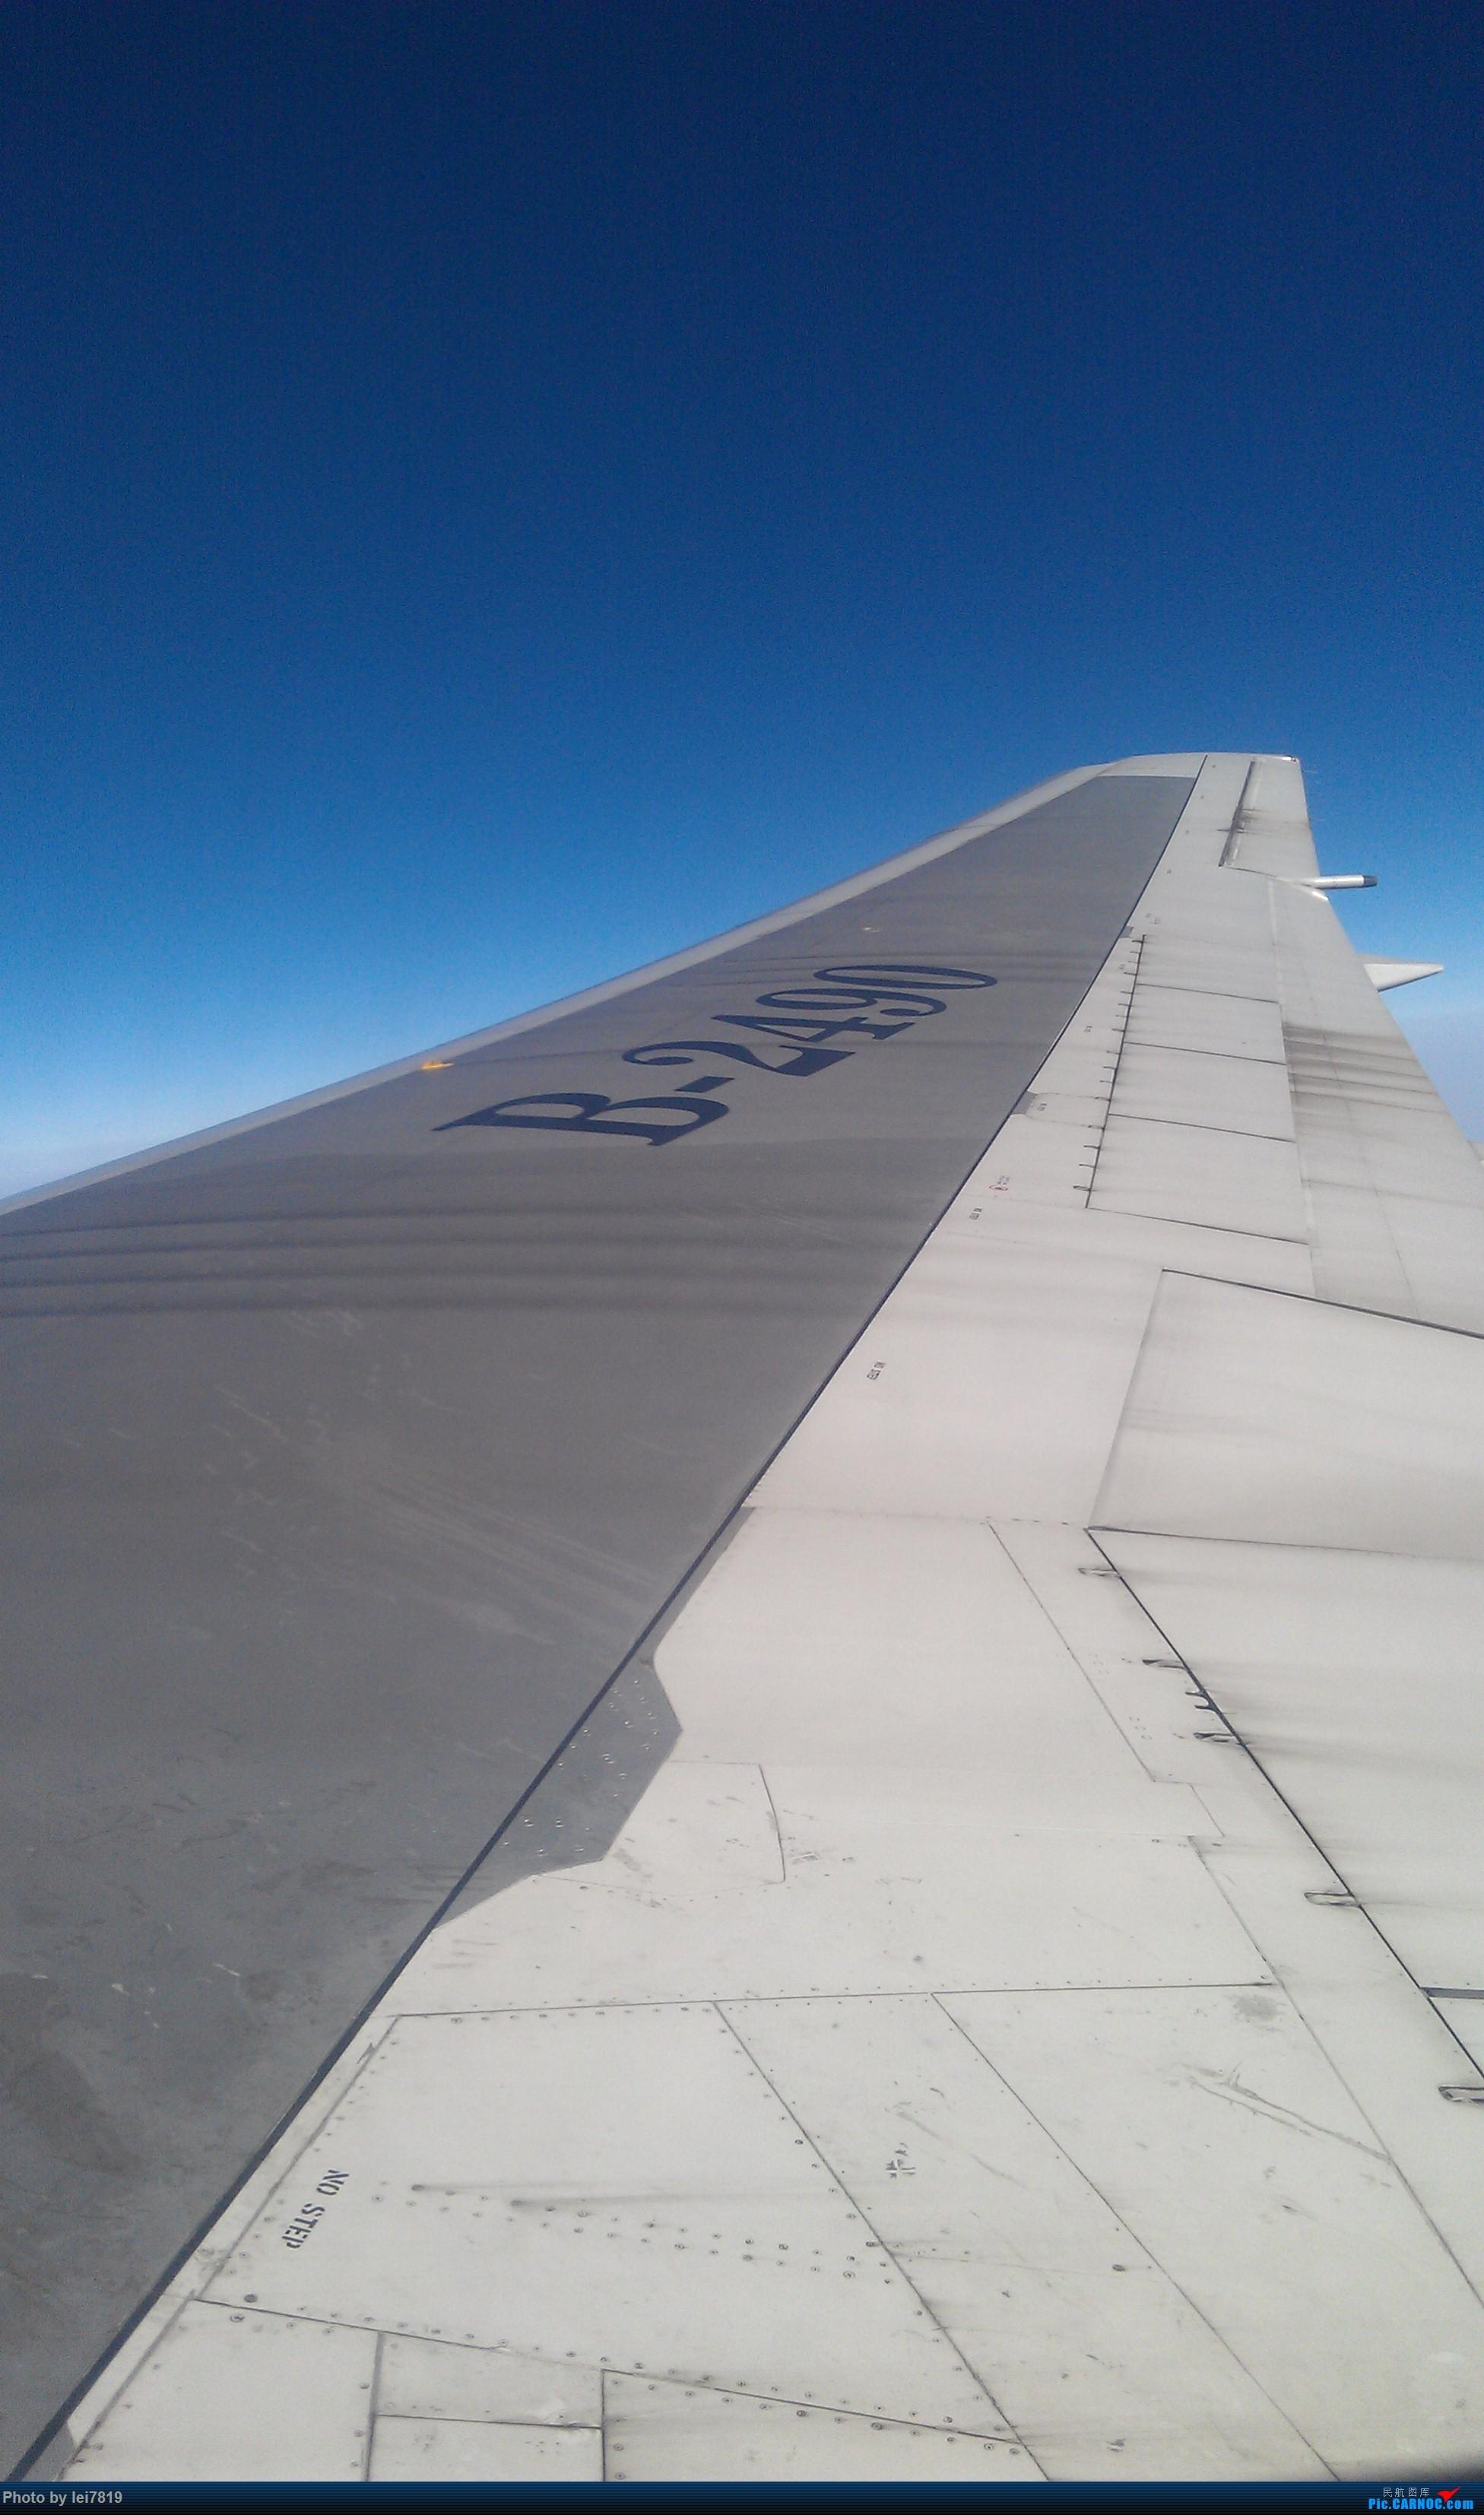 Re:#######海航767-300,B-2490空地大特写图一组####### BOEING 767-300